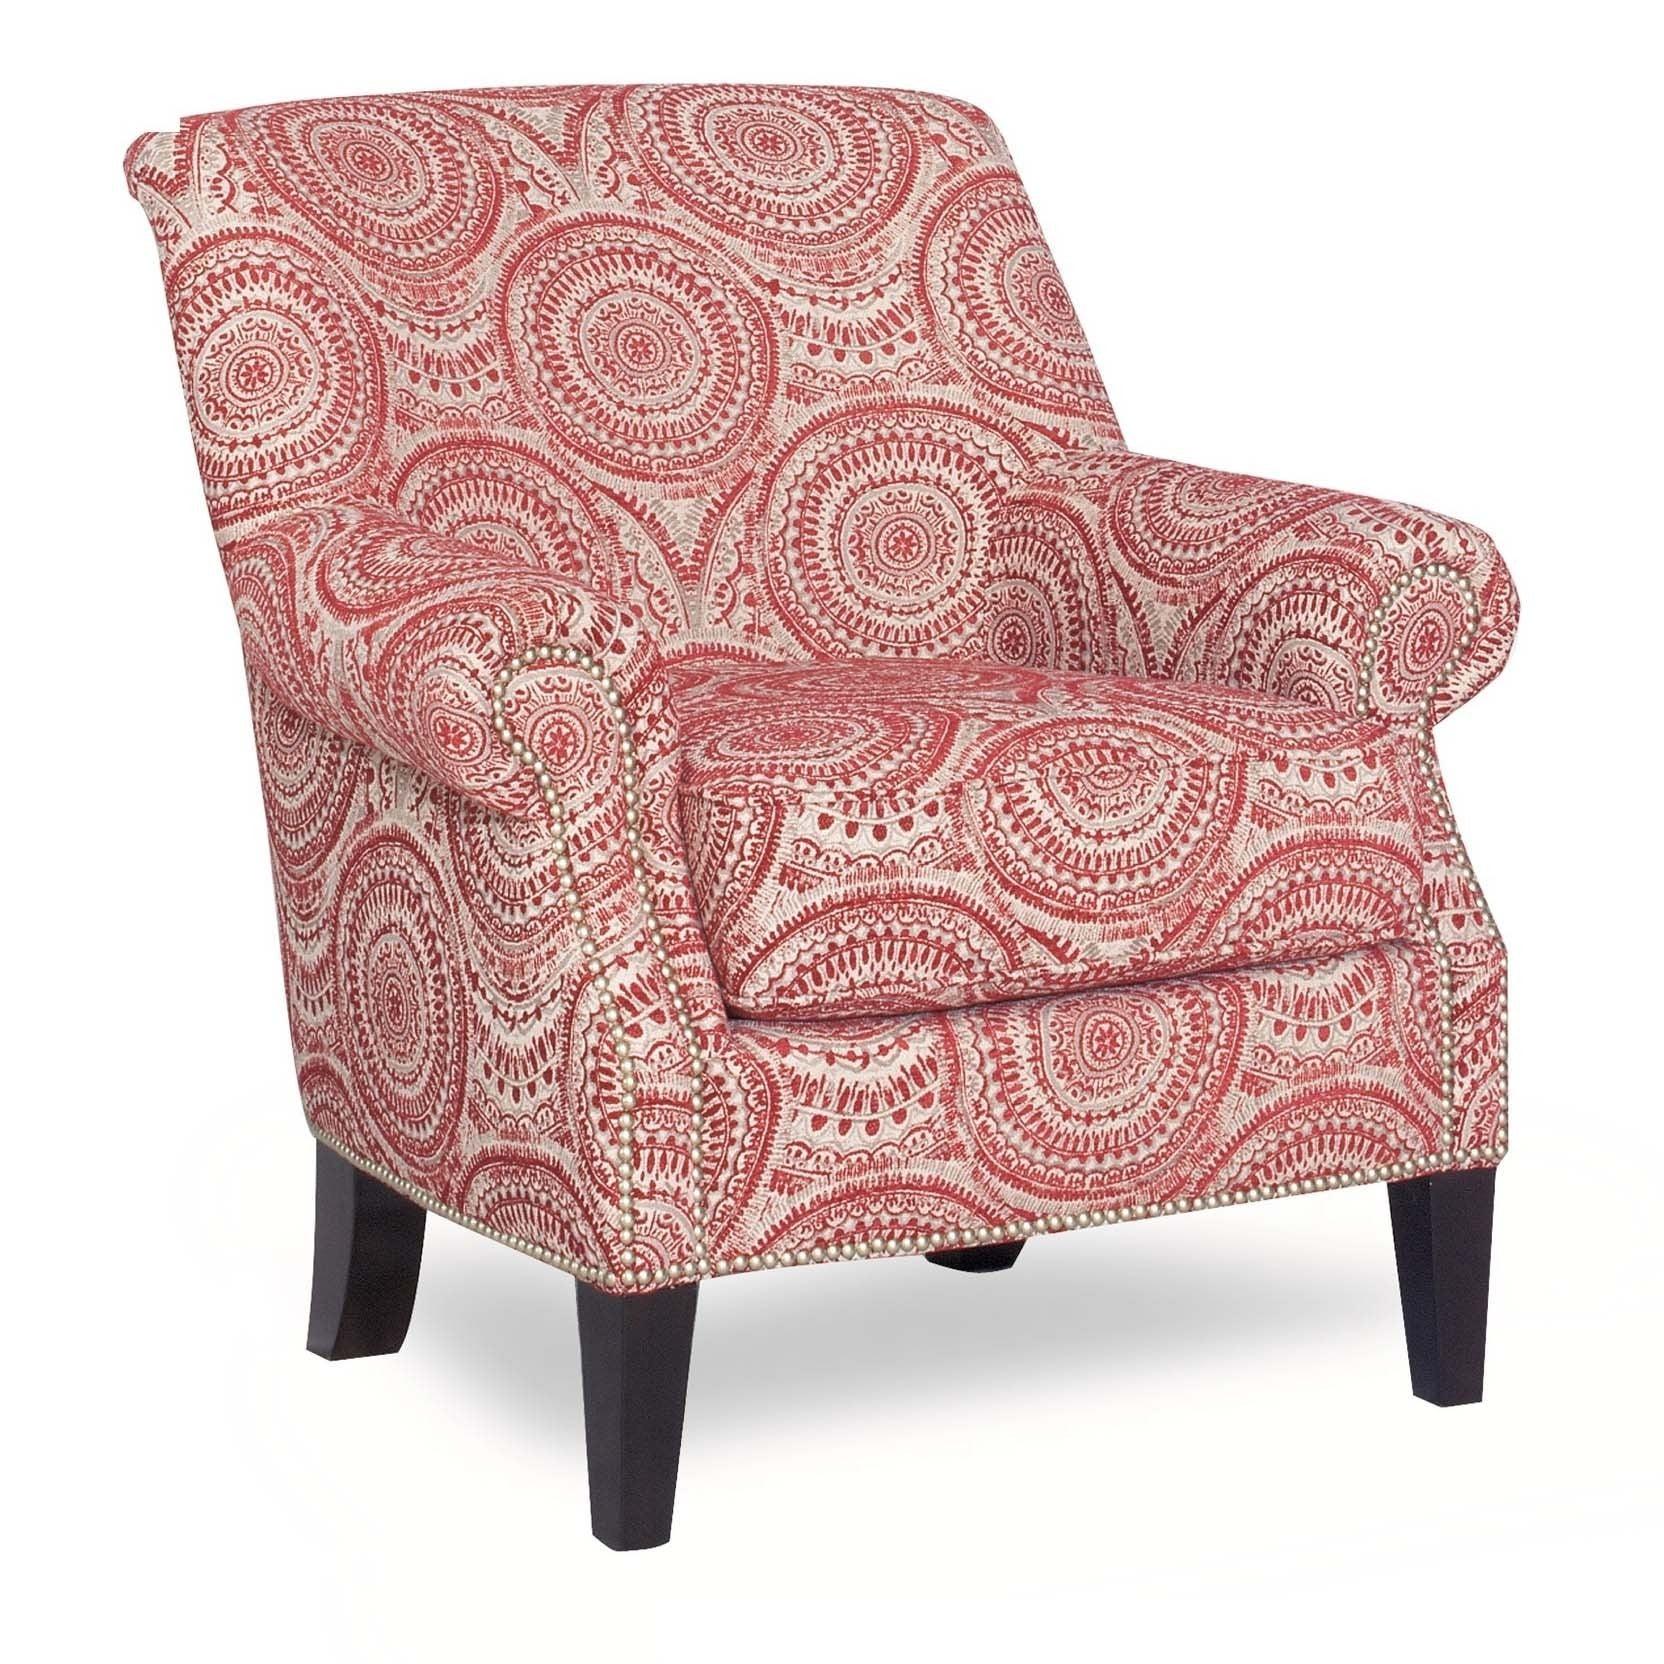 Wondrous Payton Red Medallion Print Accent Chair Inzonedesignstudio Interior Chair Design Inzonedesignstudiocom